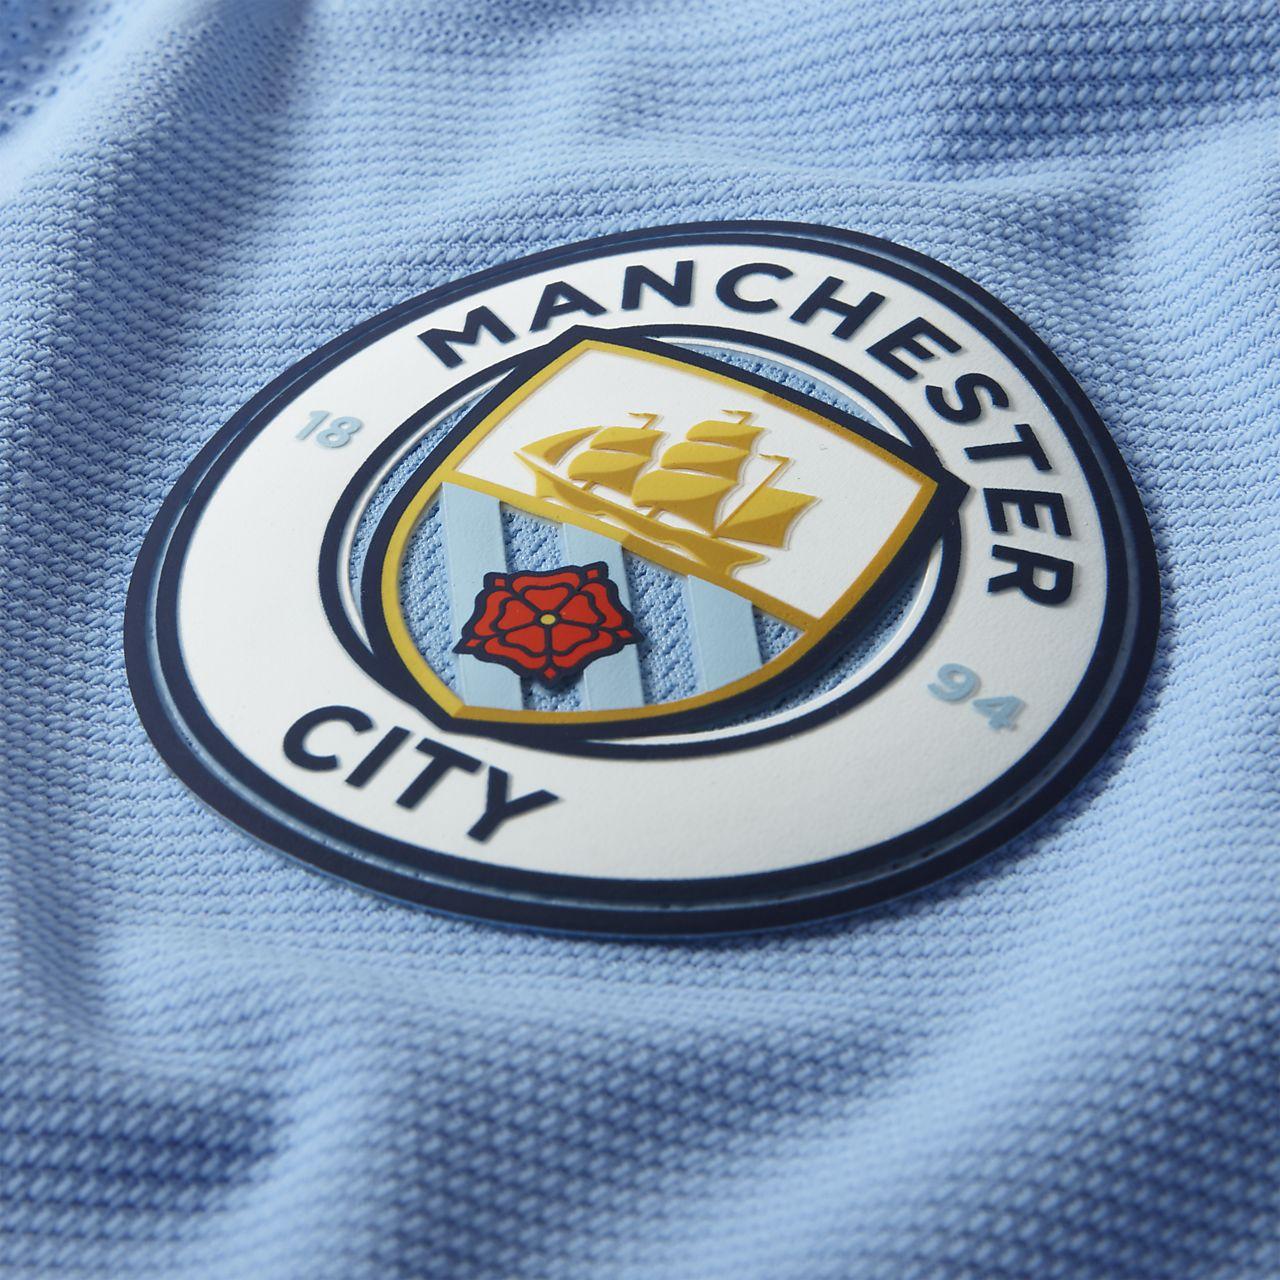 Delapan Manchester City Fc Vapor Match Home Mens Football Shirt